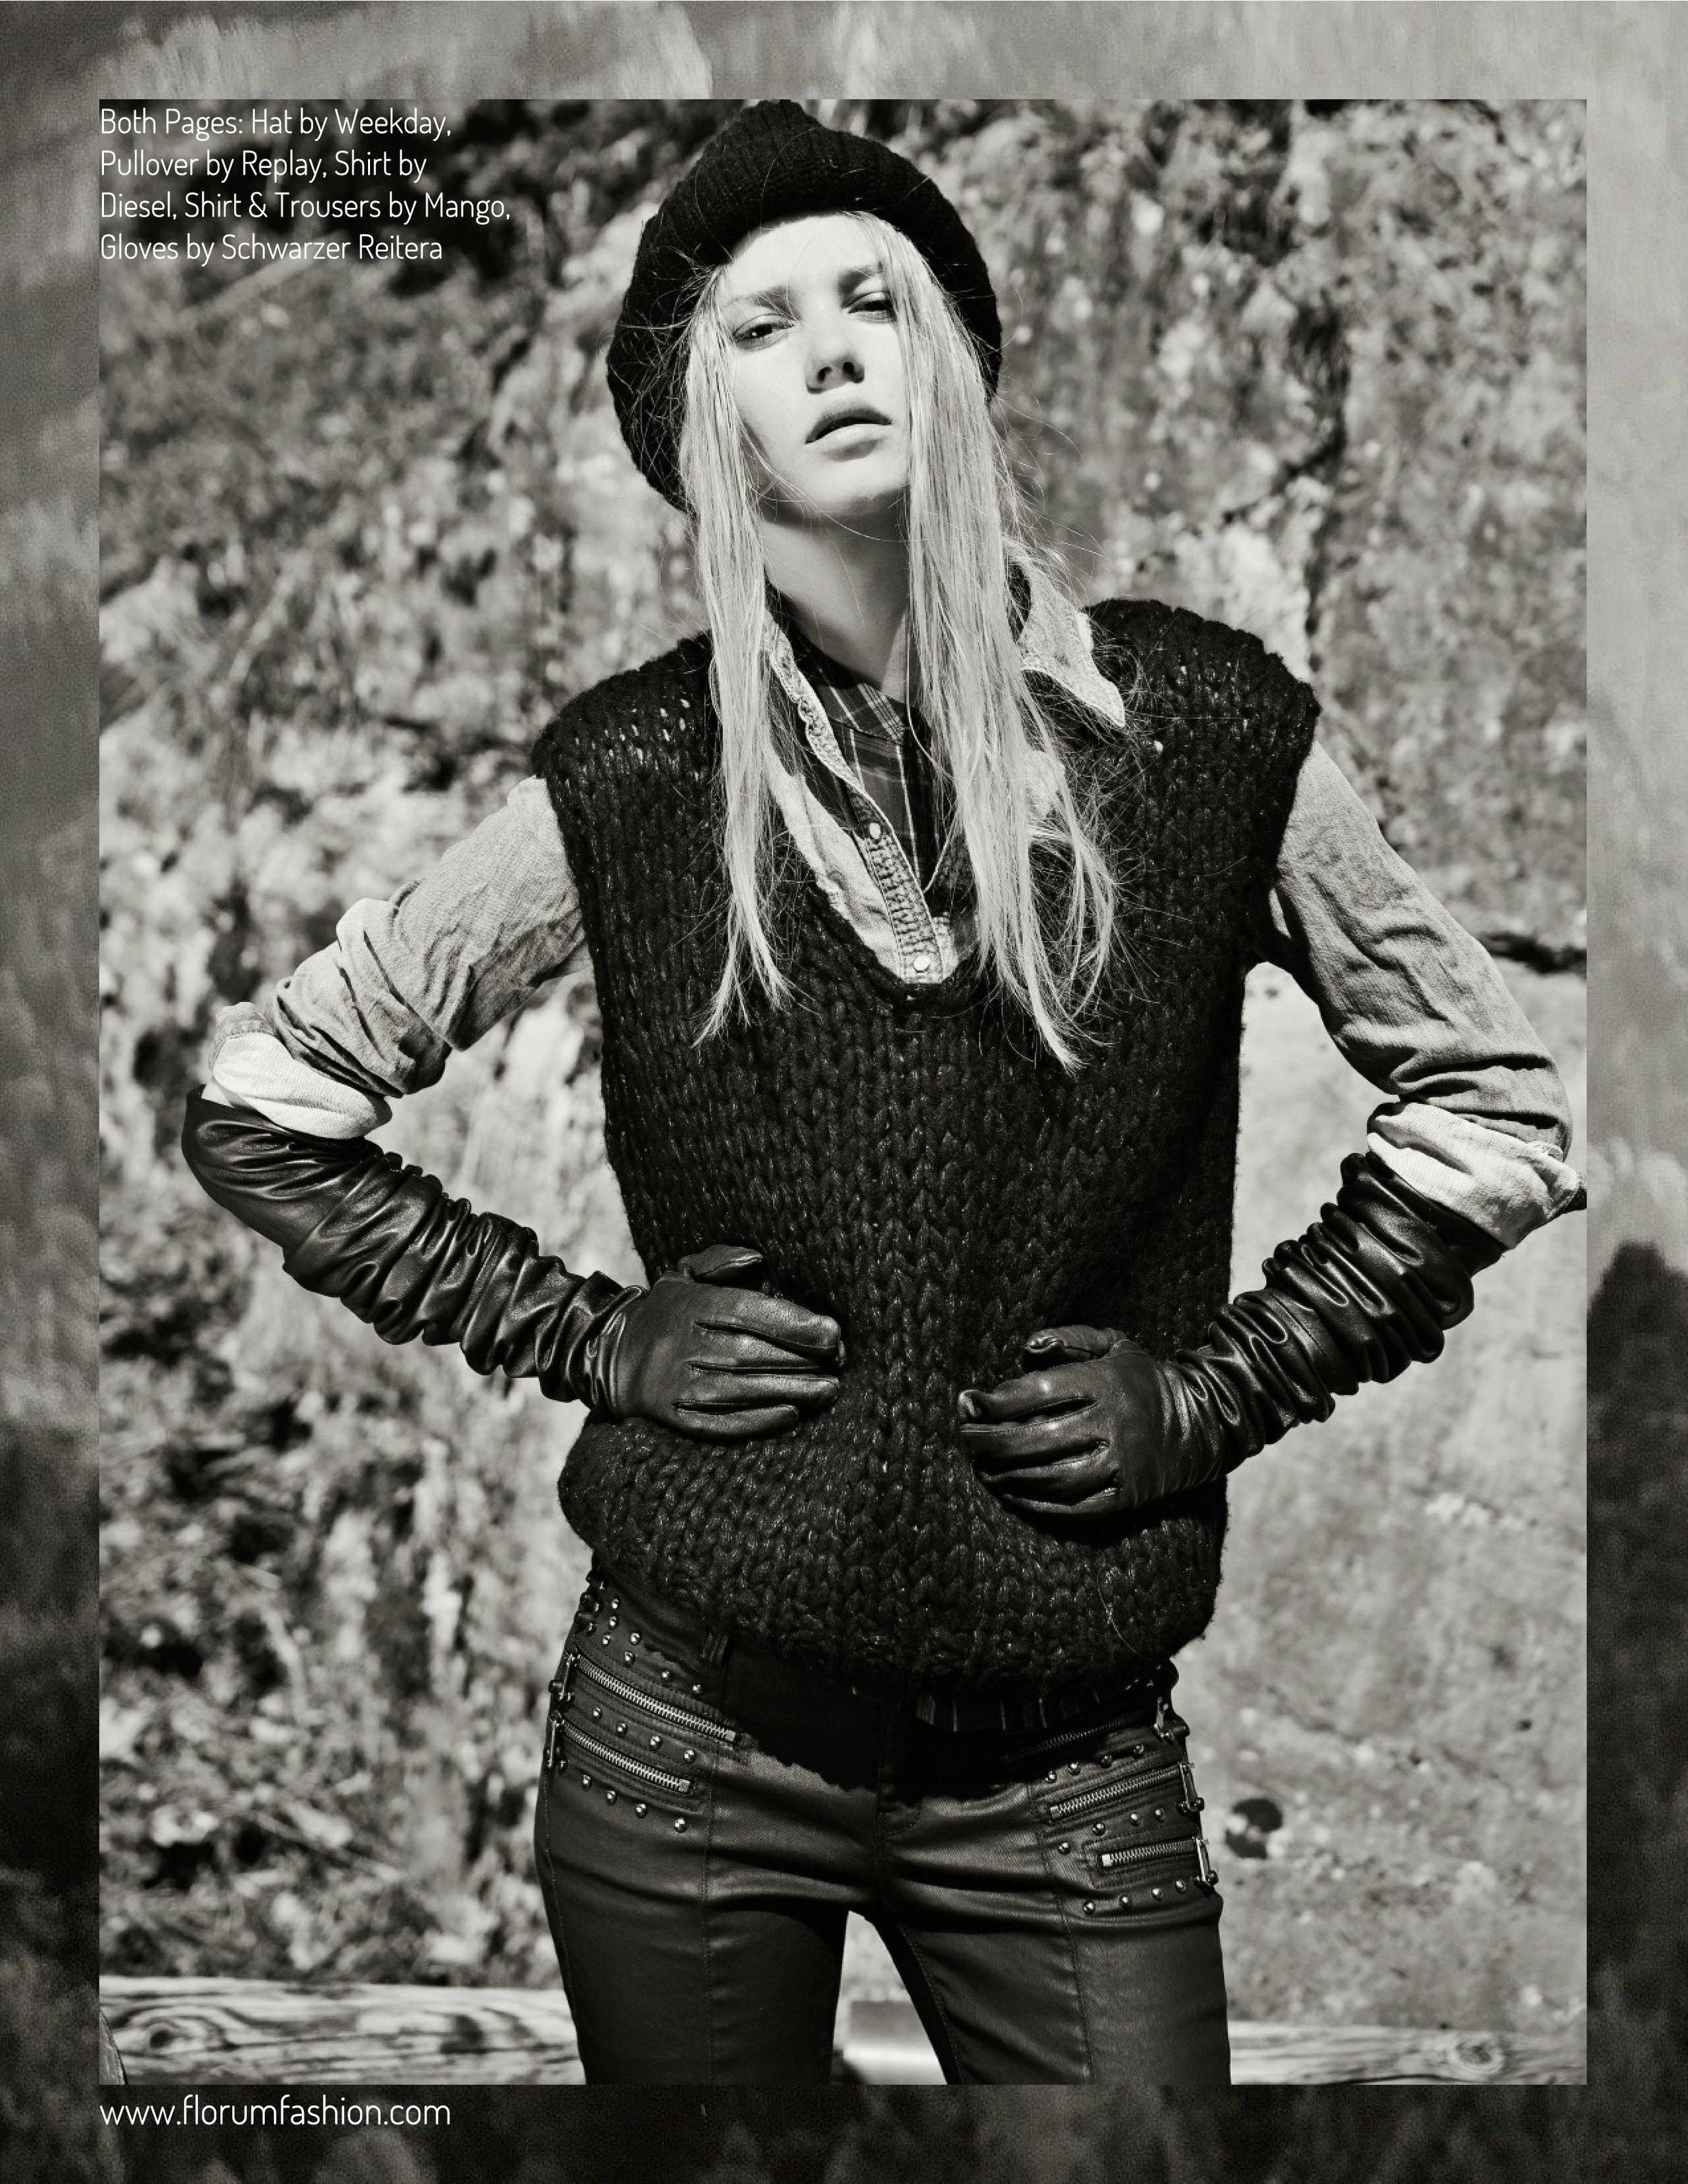 Green Fashion Editorial photographed by Heiko Laschitzki Java Models Munich Models Florum Fashion Magazine